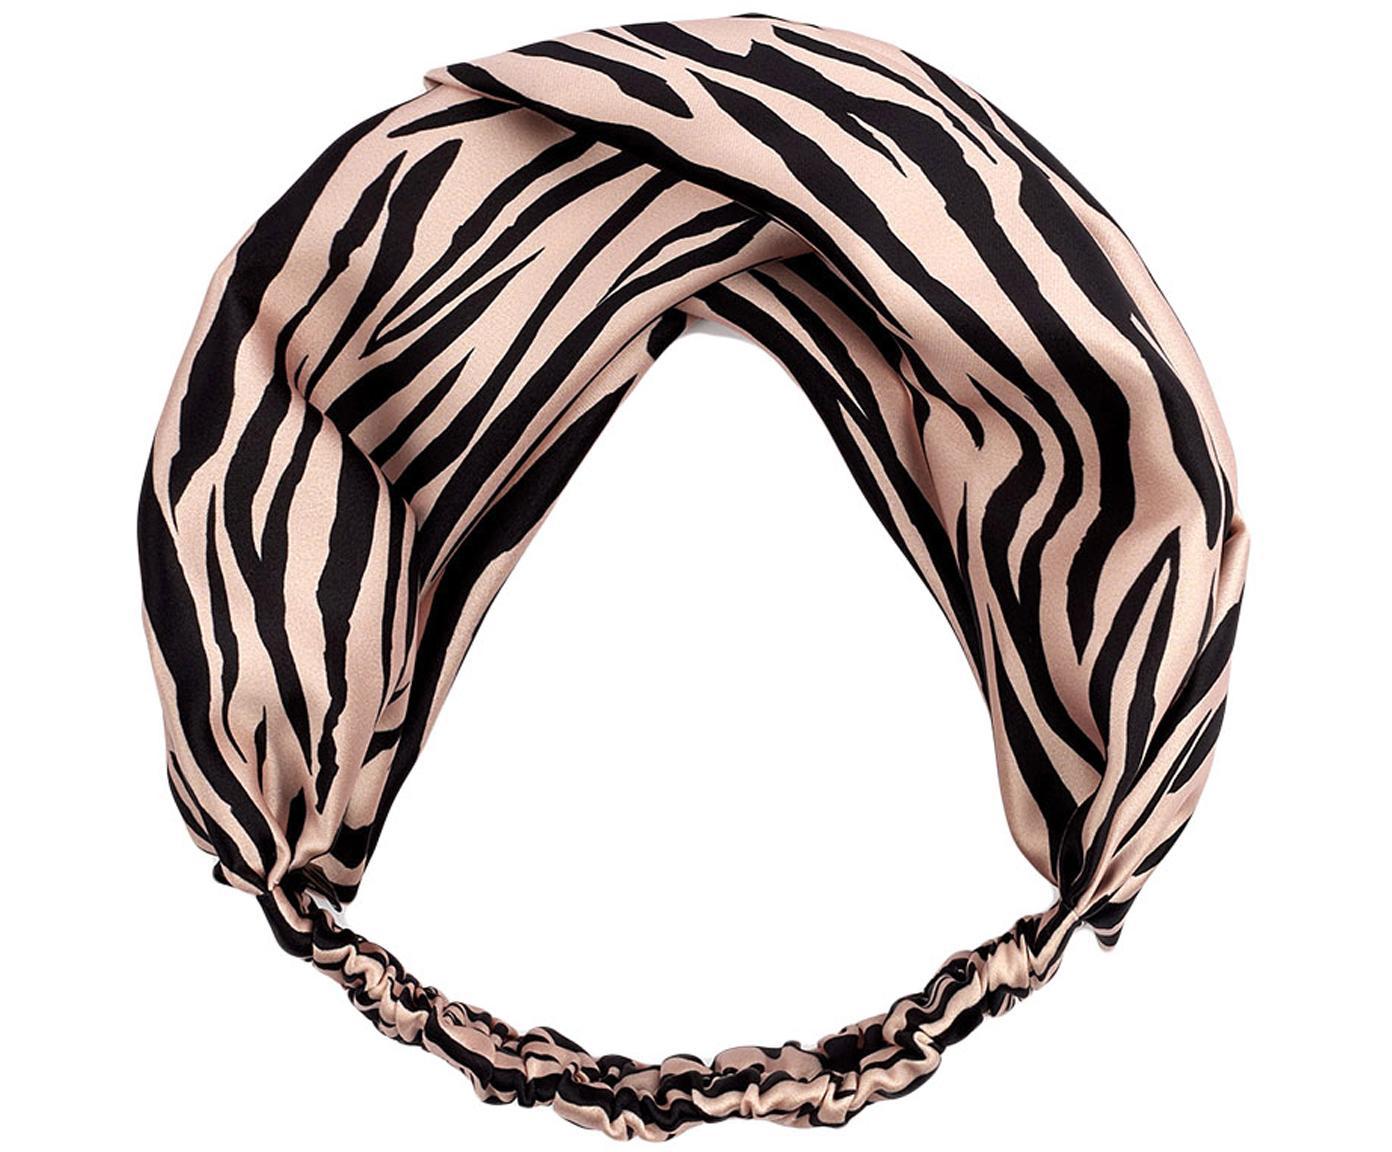 Haarband Soft Tiger, Webart: Satin, Rosa, Schwarz, Ø 29 cm